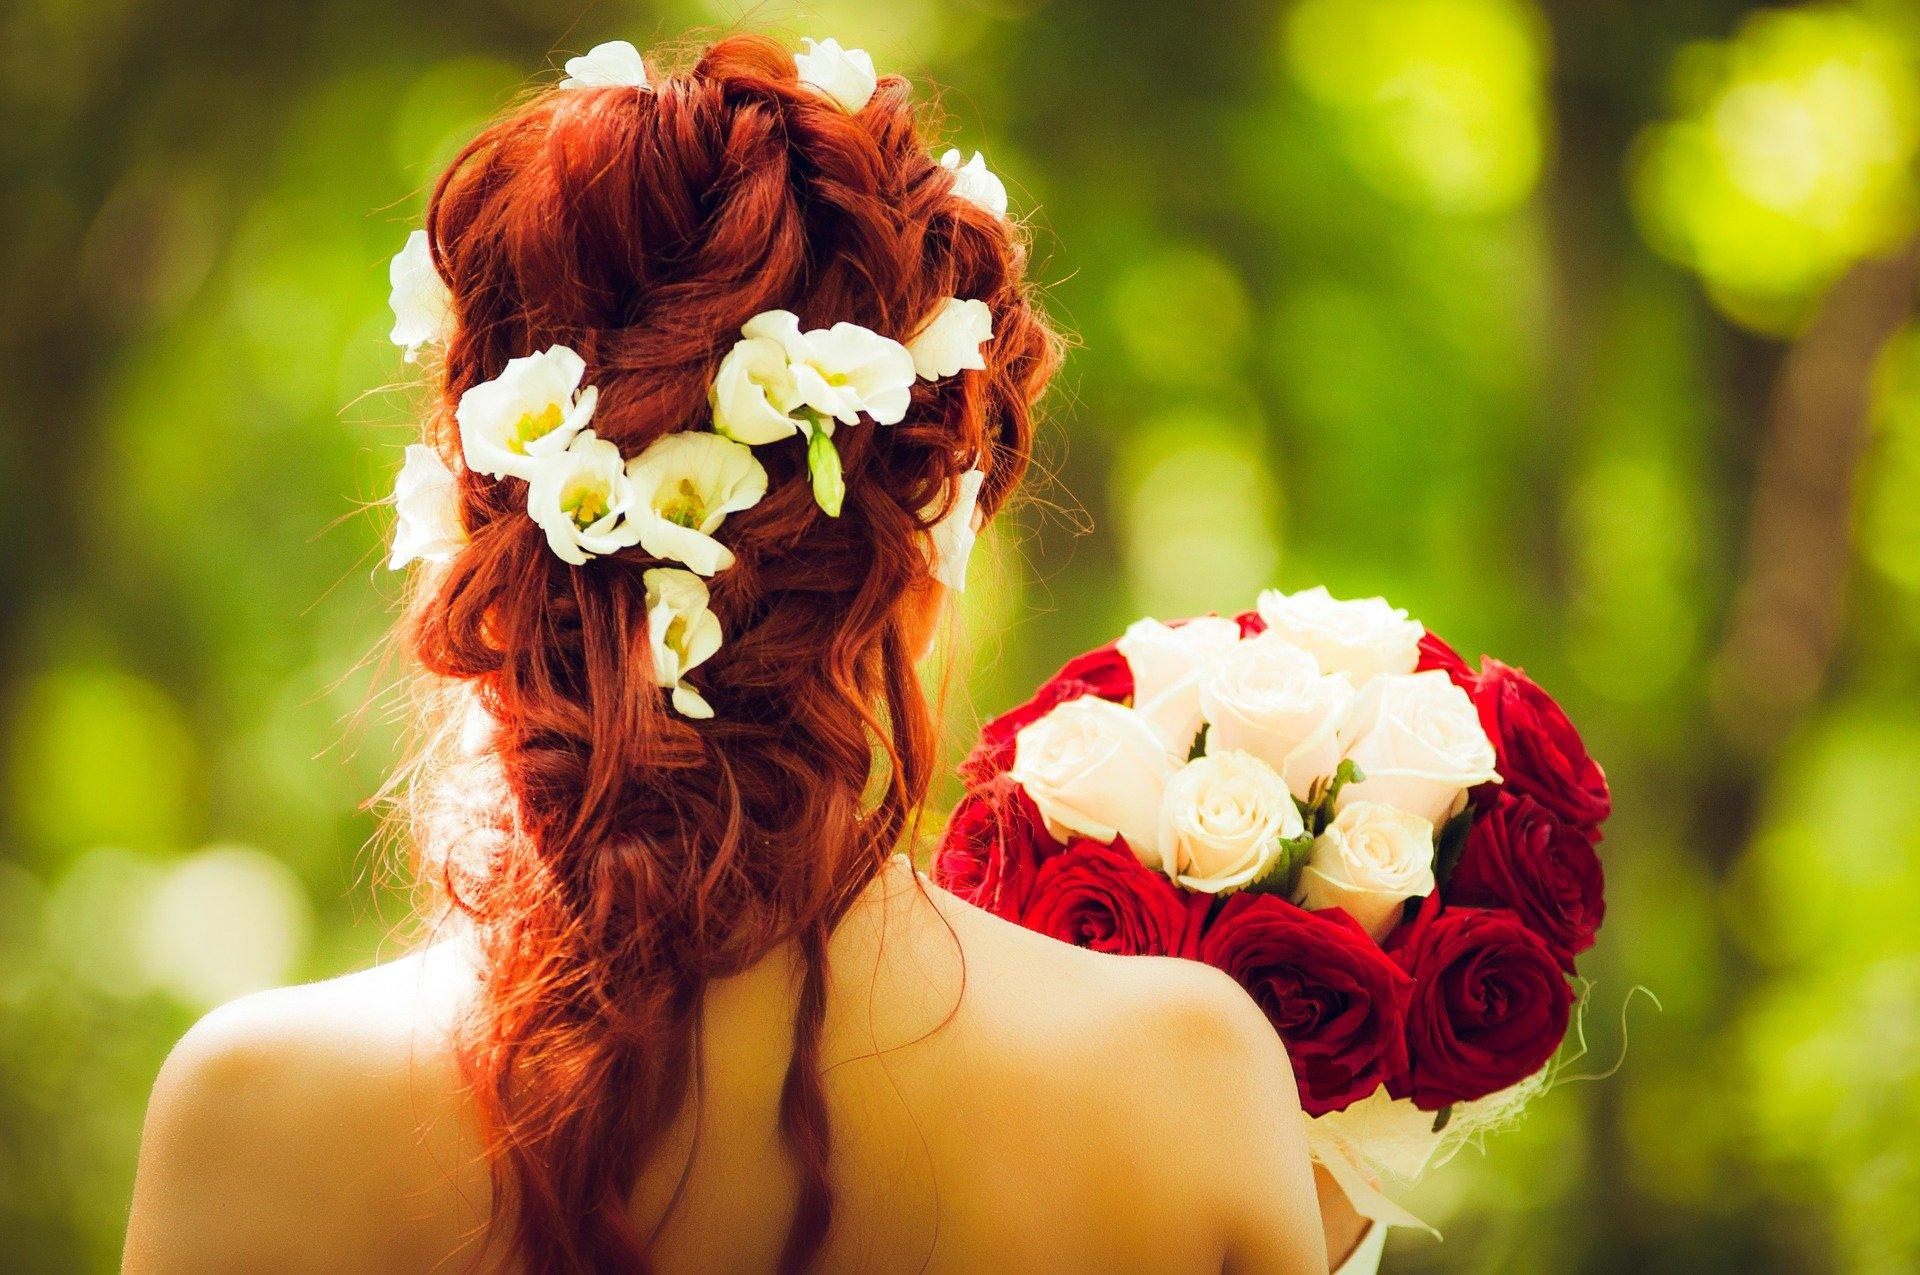 Organiser un mariage original